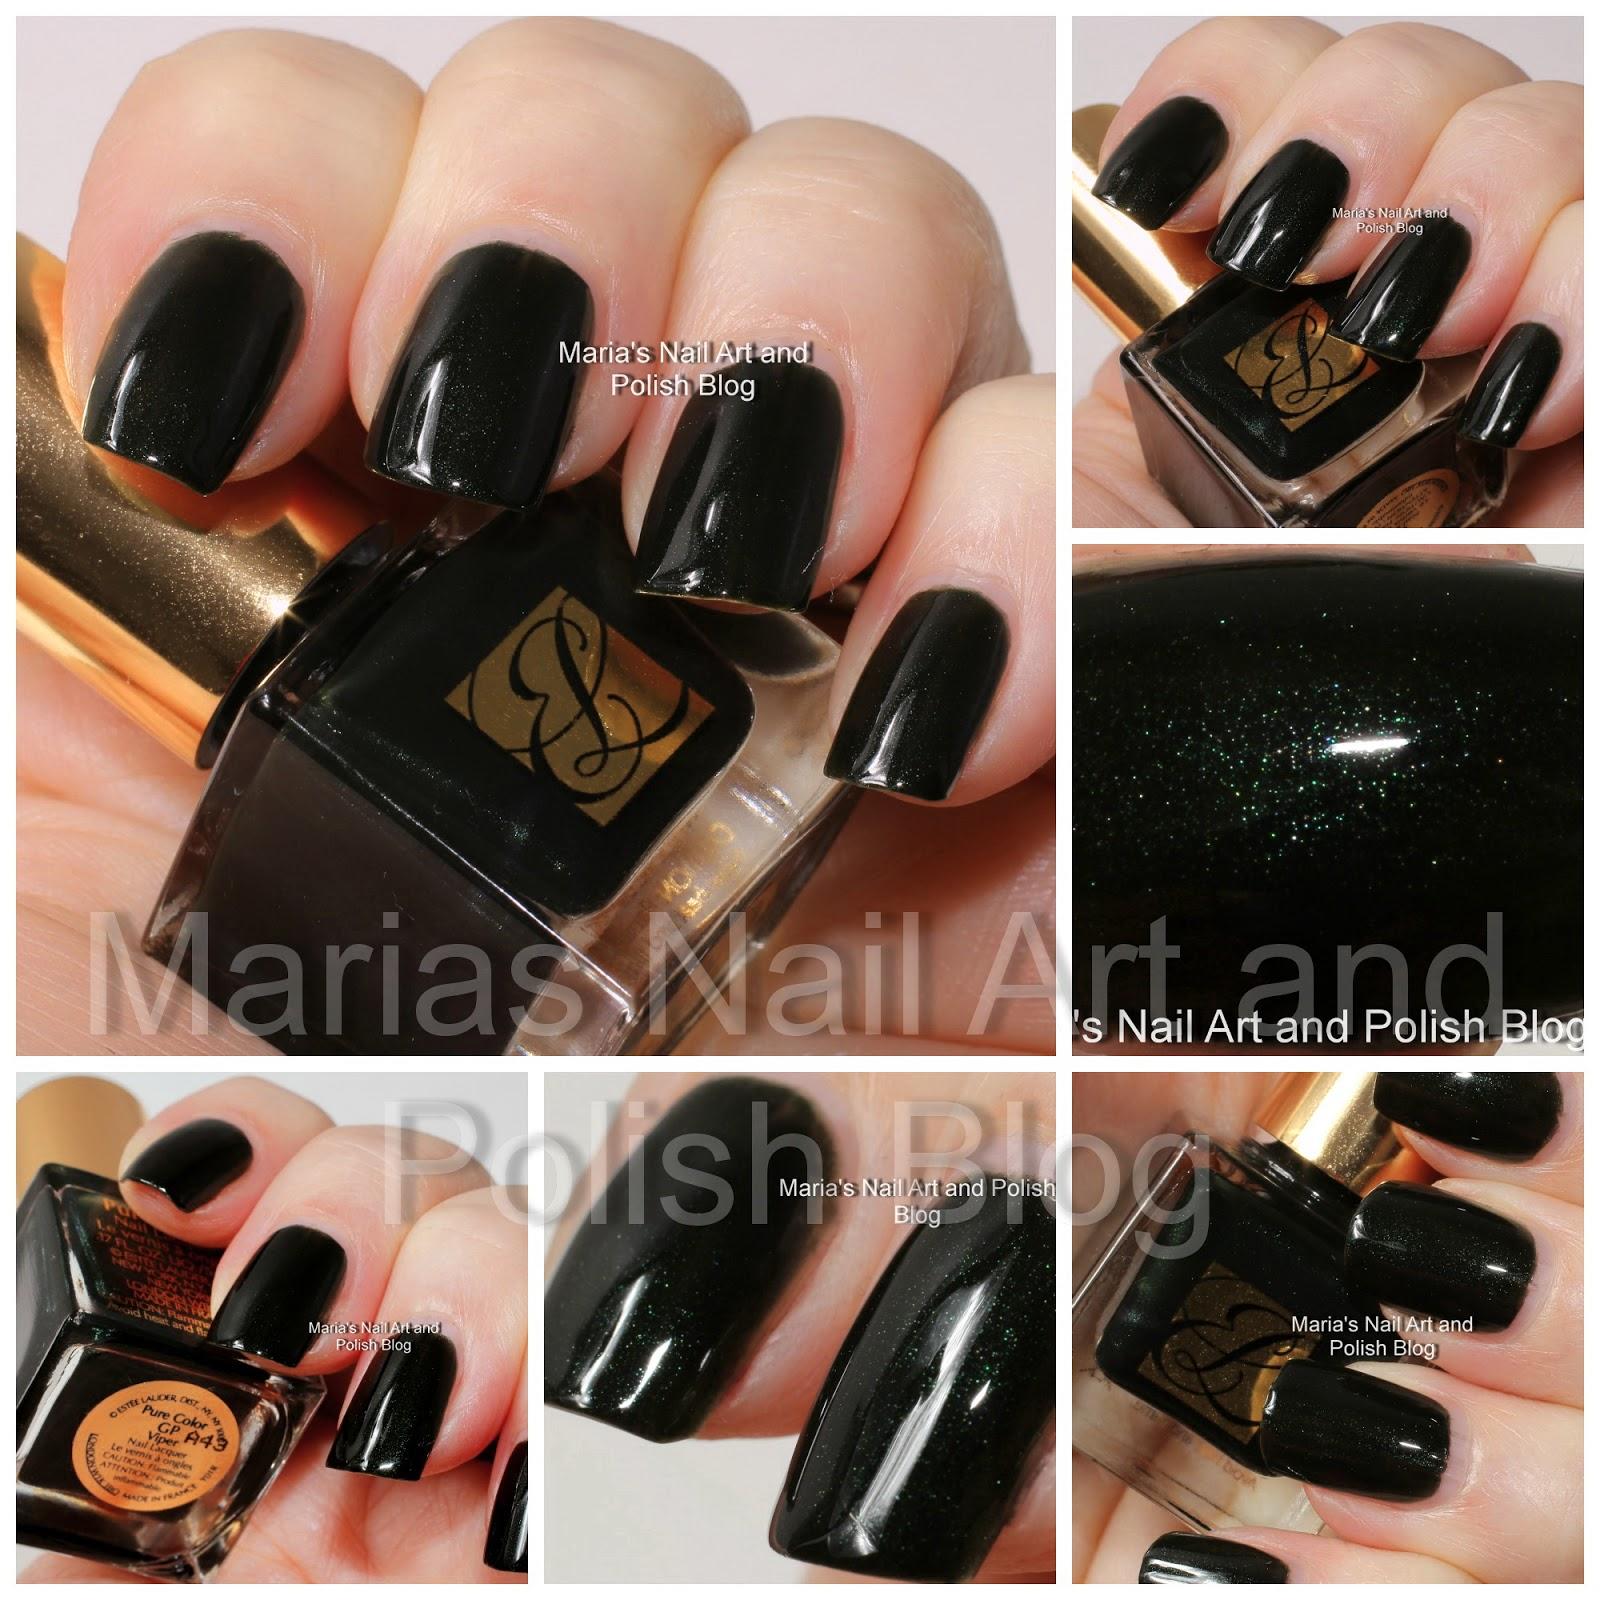 Marias Nail Art and Polish Blog: Estée Lauder Viper, Beyond Black ...